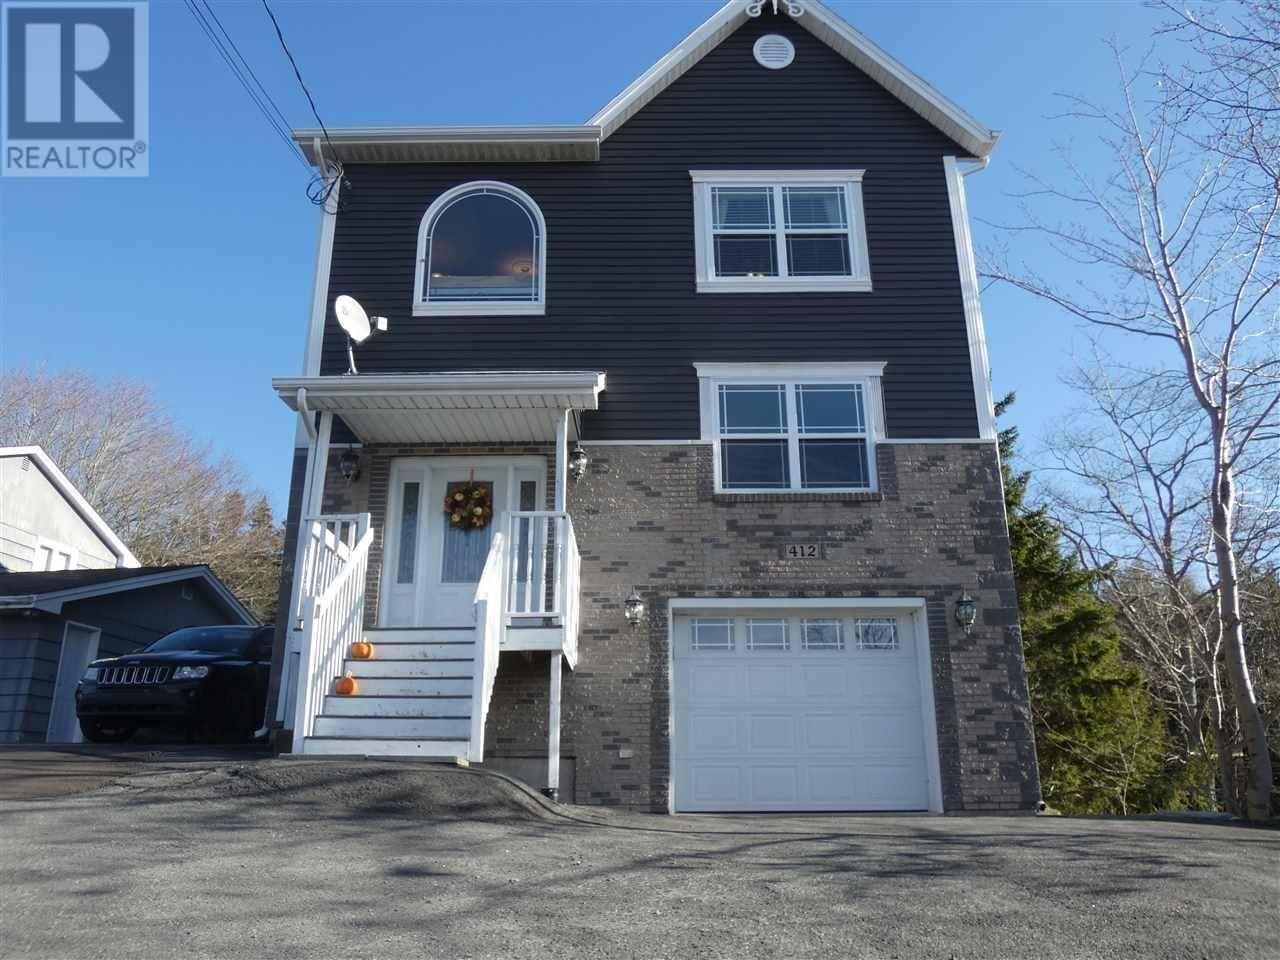 House for sale at 412 Waverley Rd Dartmouth Nova Scotia - MLS: 201926607